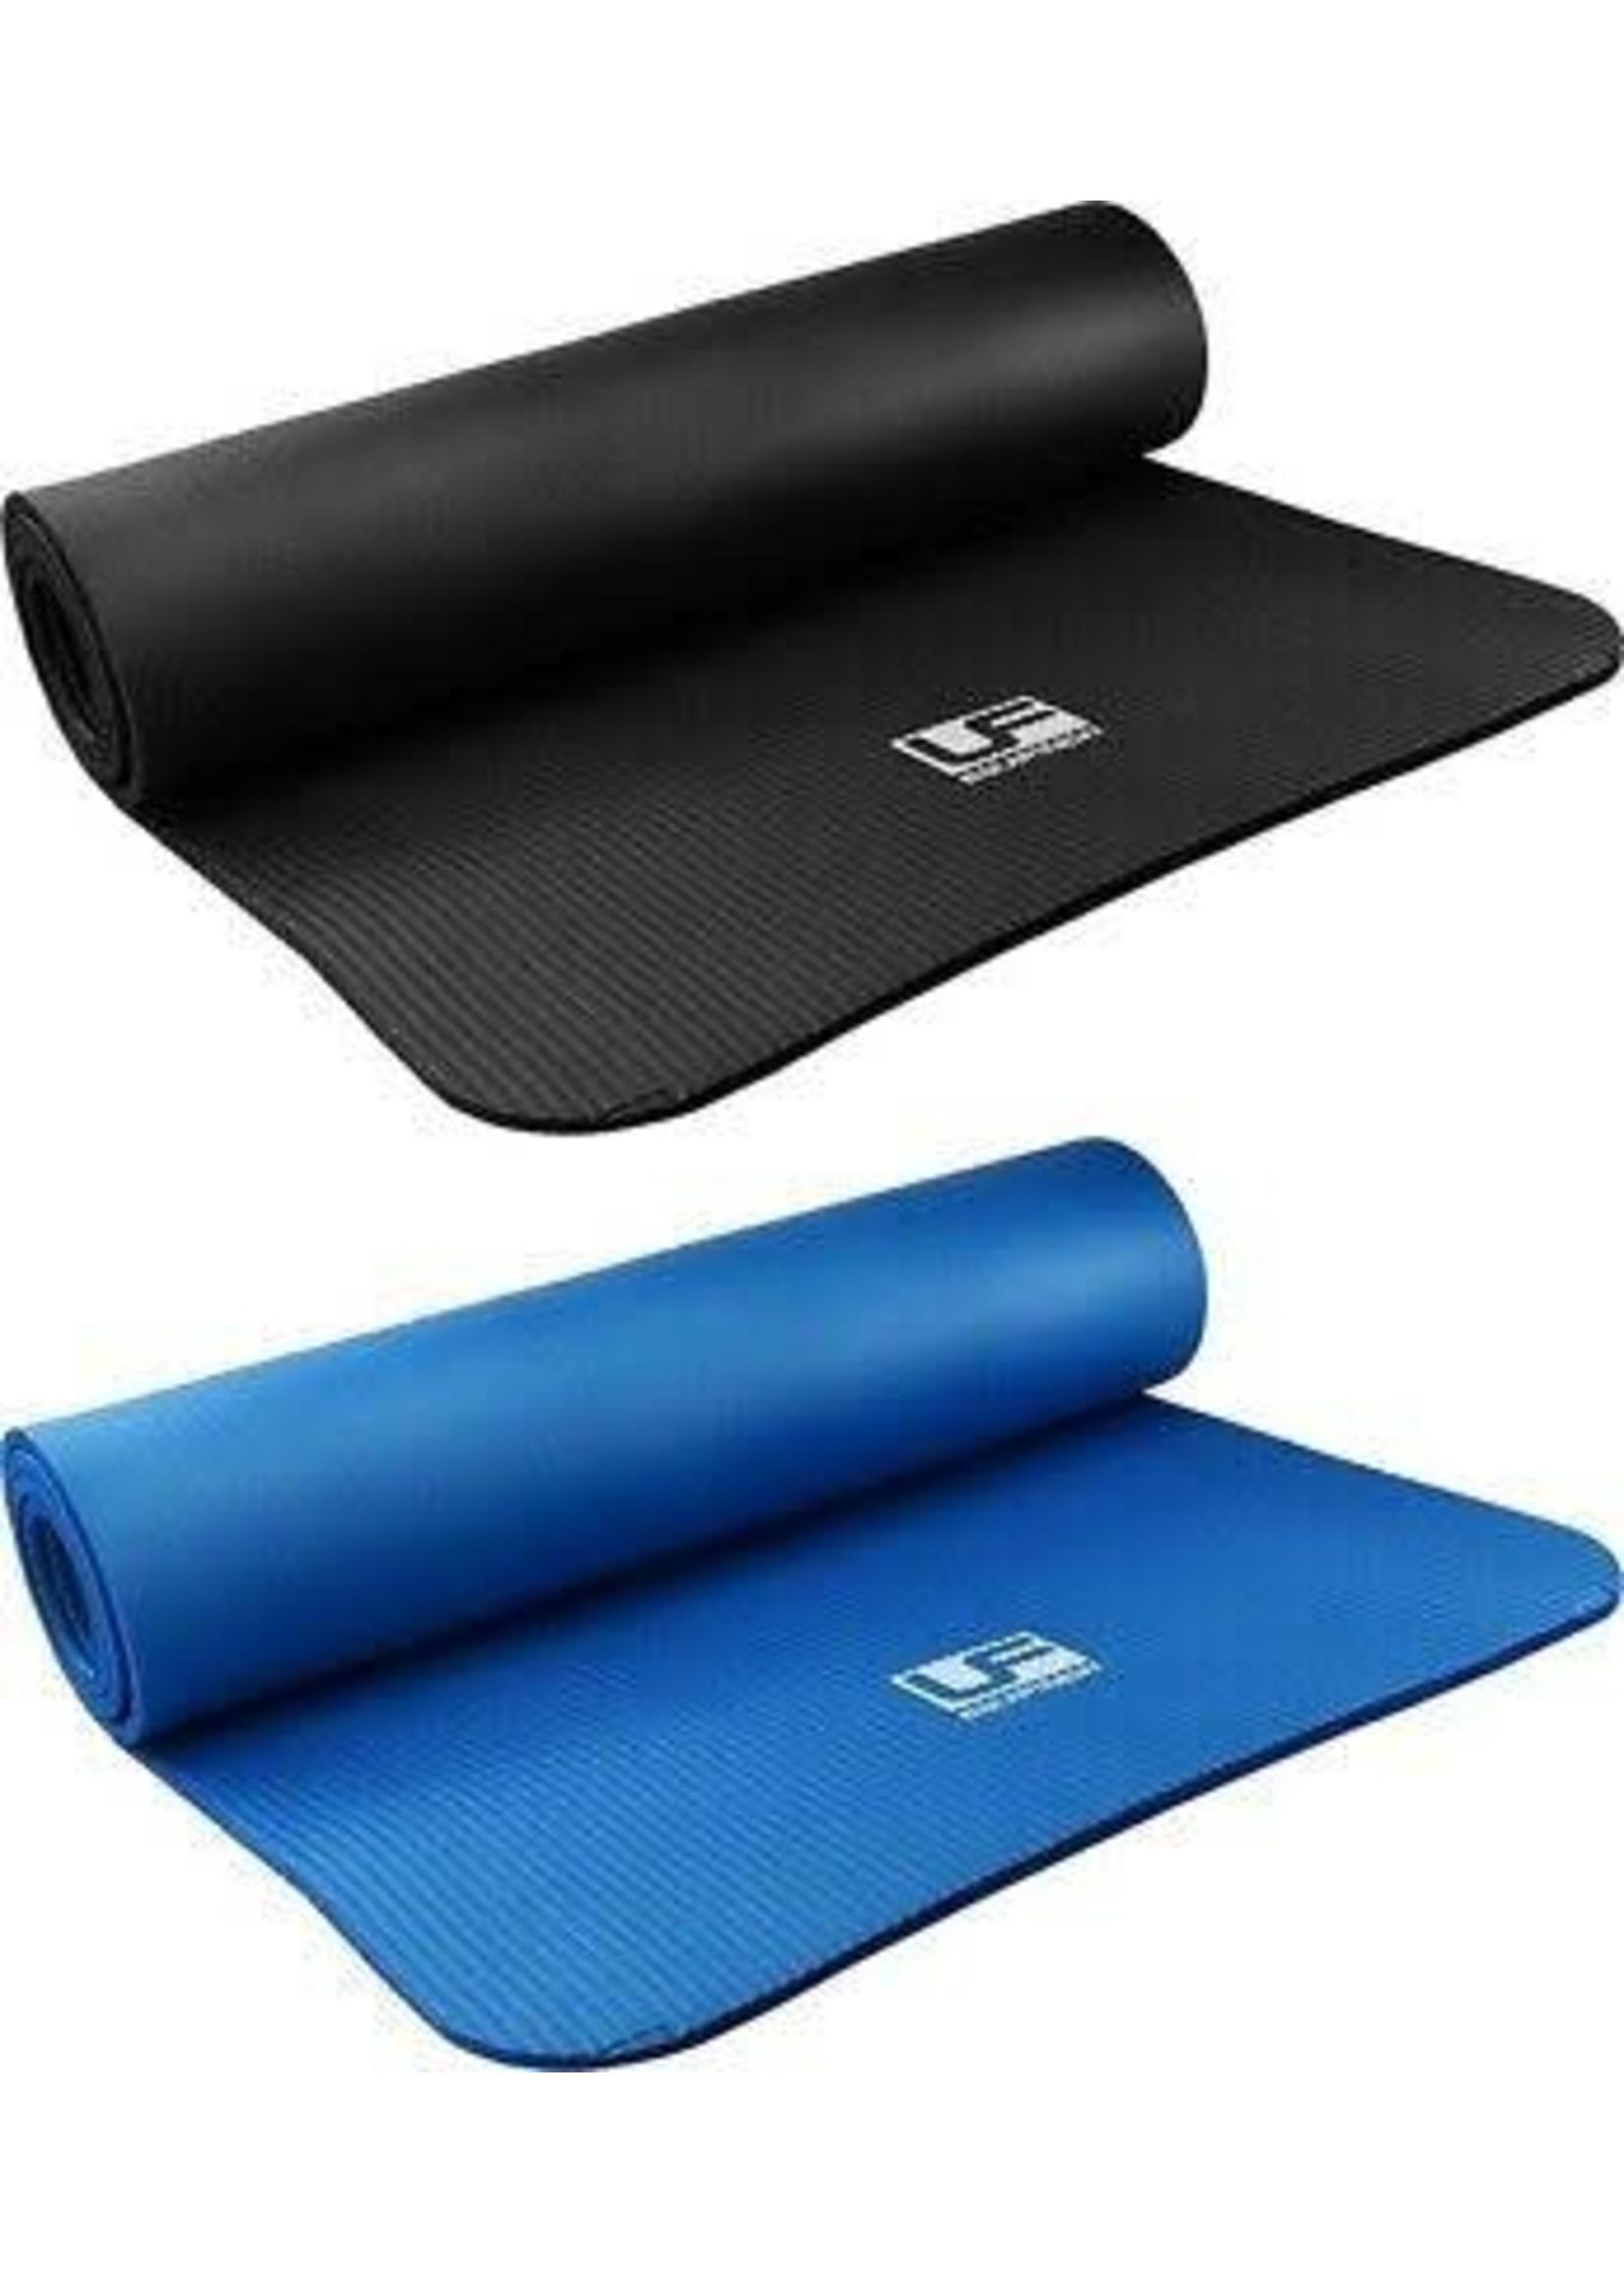 UFE Fitness Mat 10mm